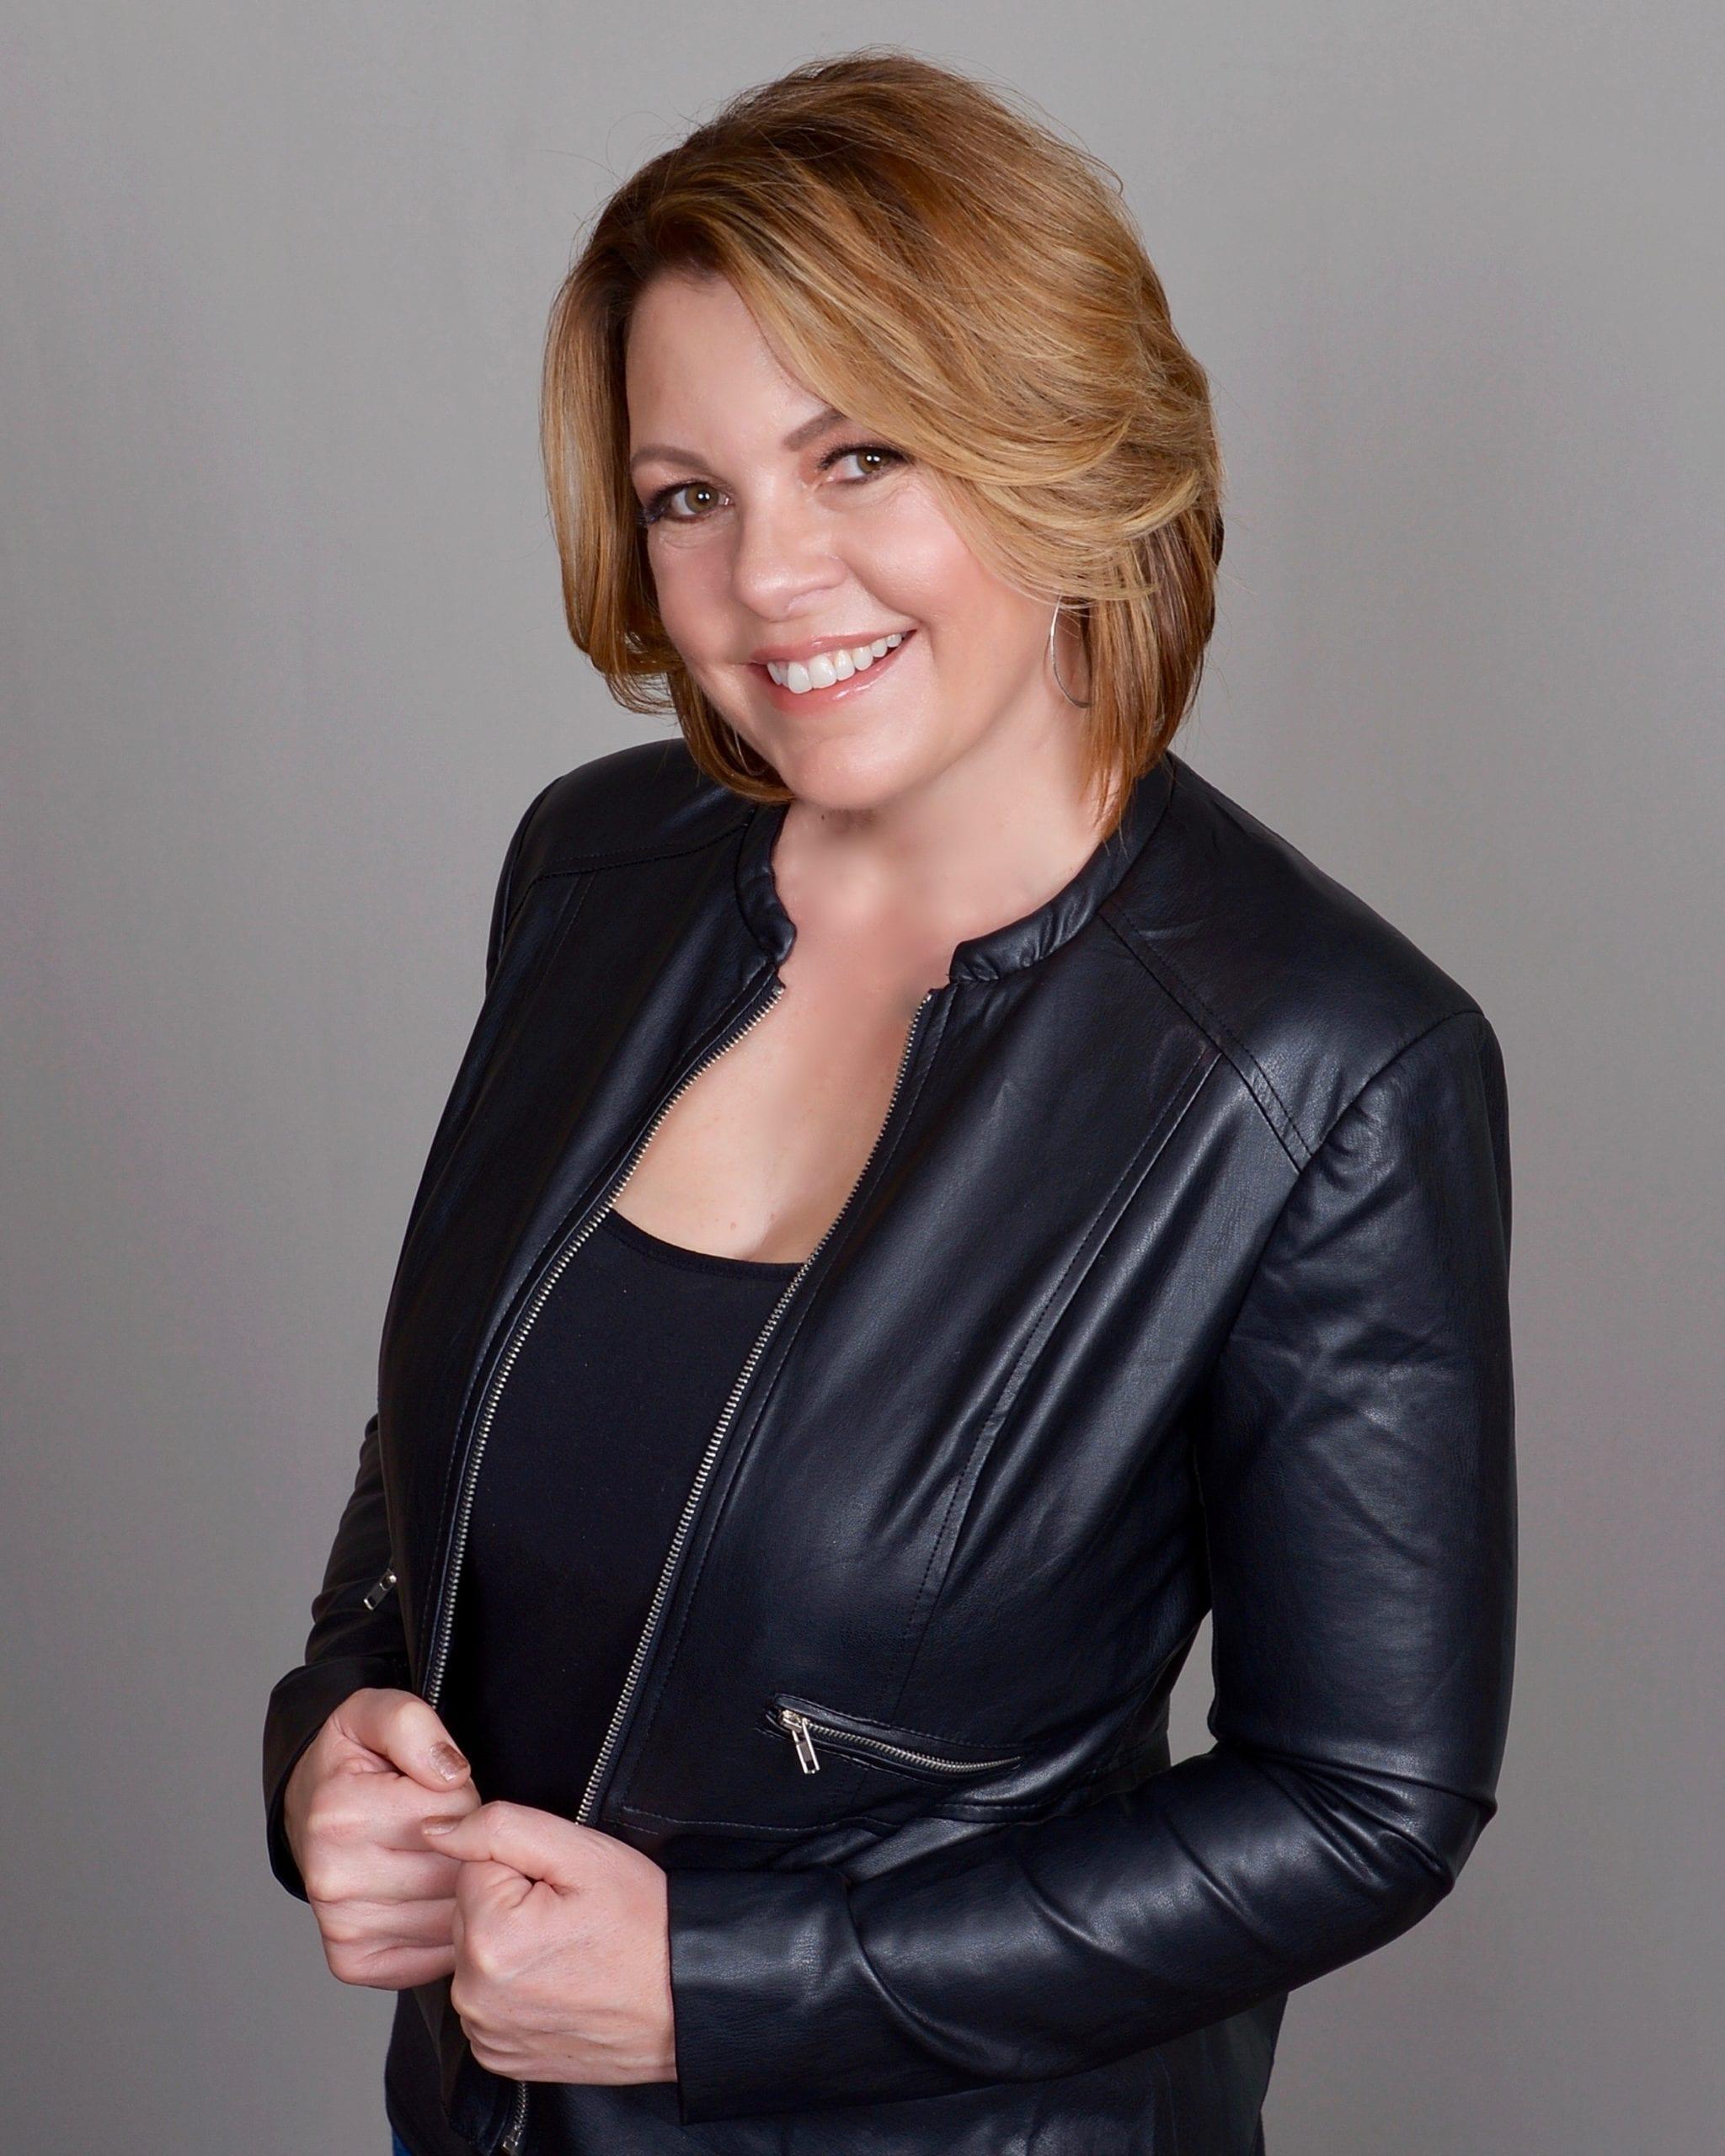 Lori Ballen Las Vegas Real Estate Agent